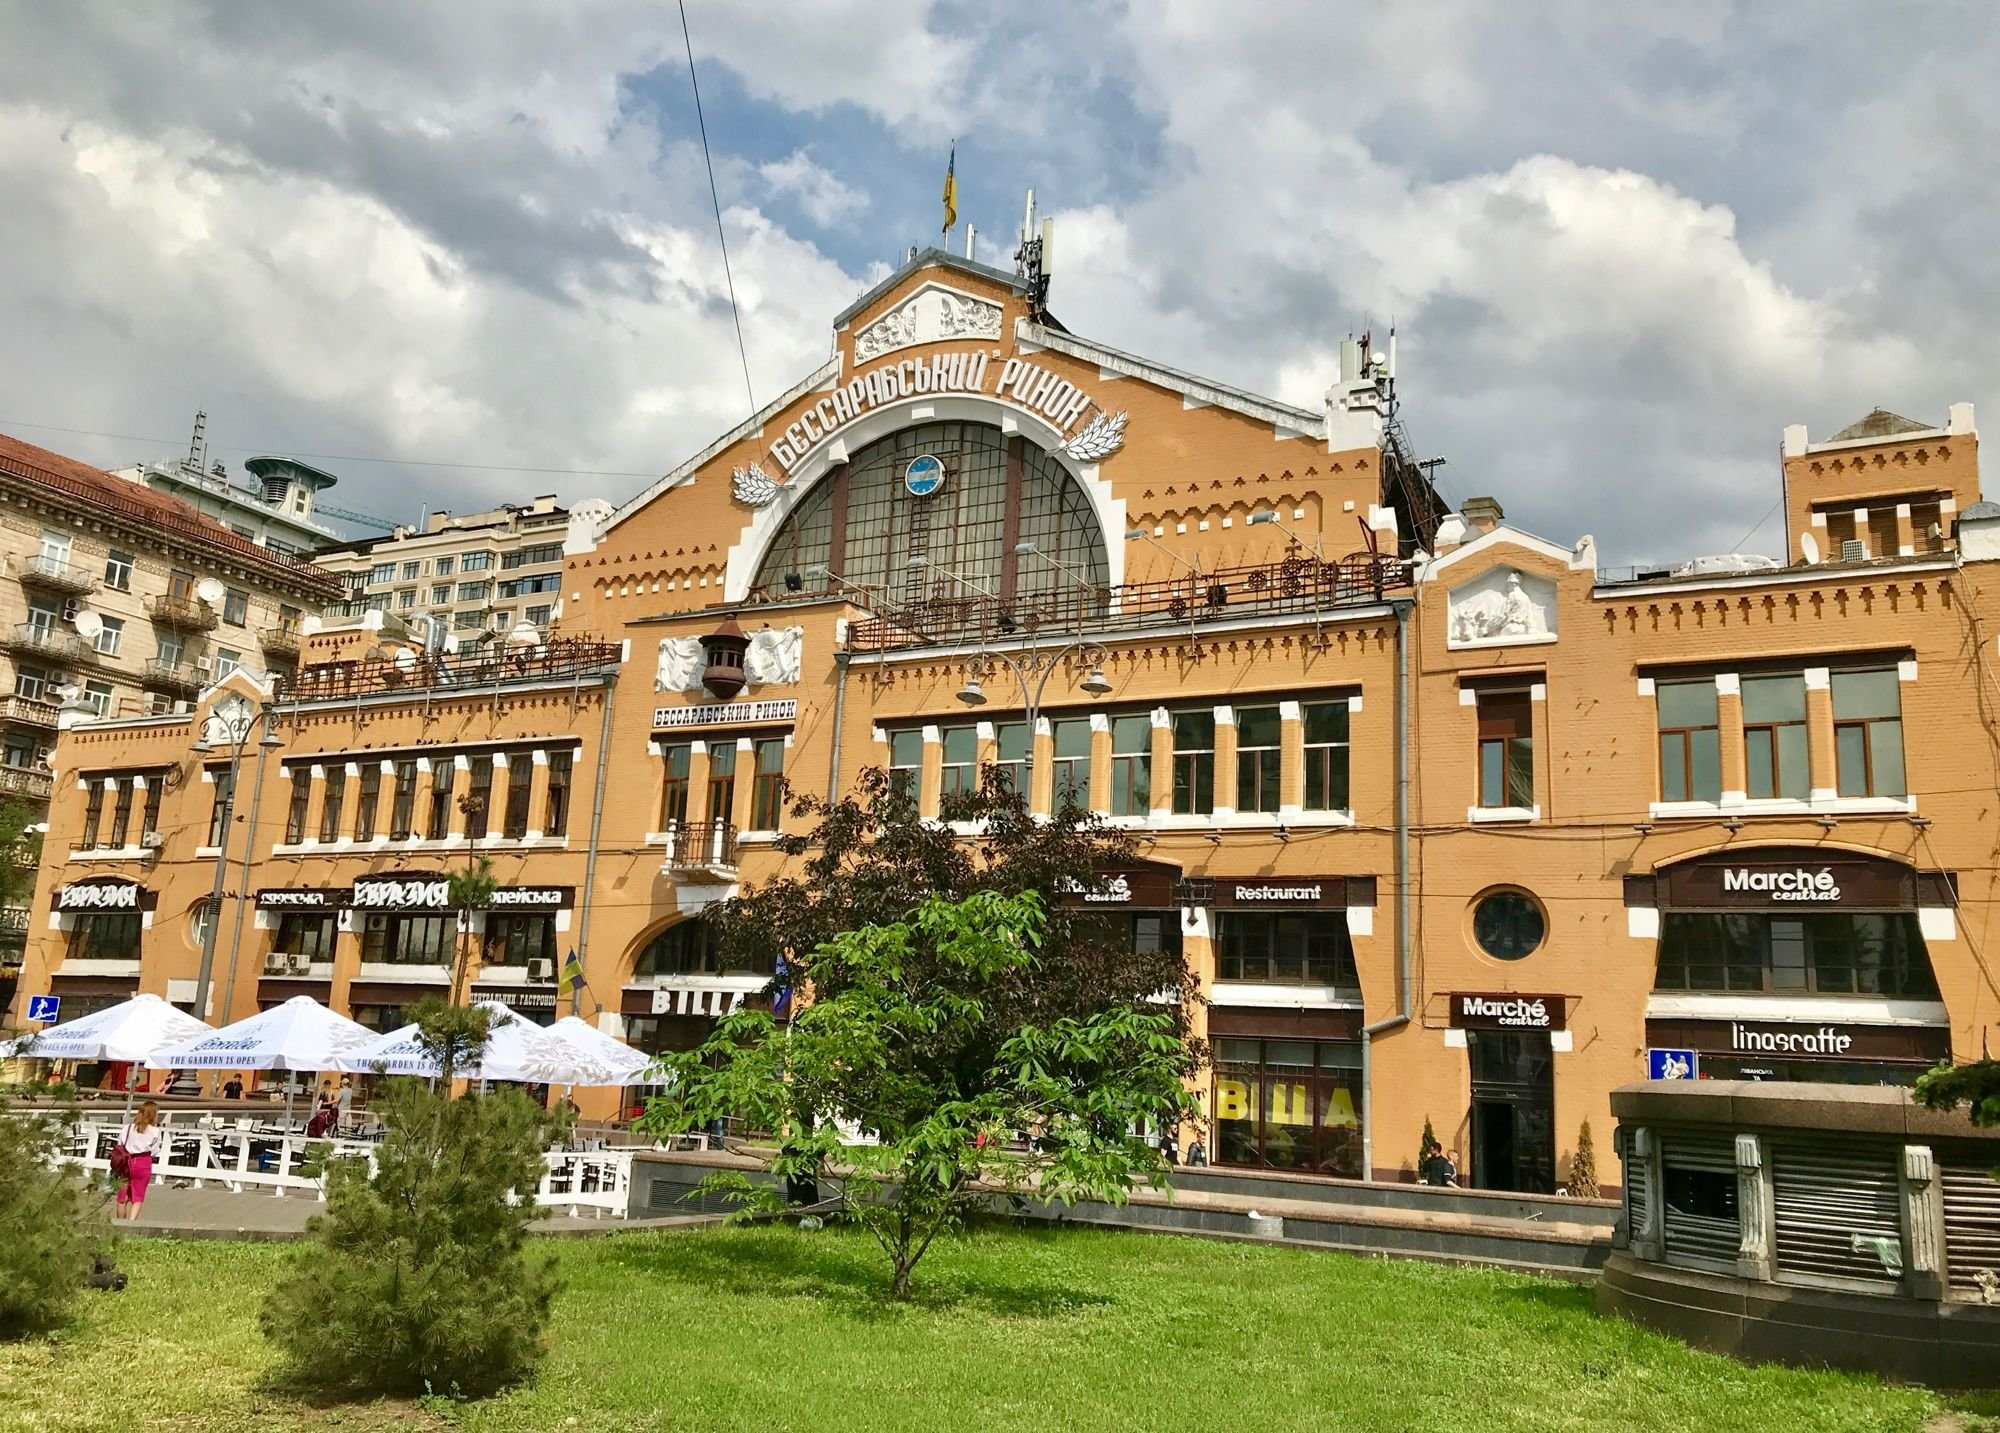 Топ 7 фактов о Бессарабке: рынок-легенда